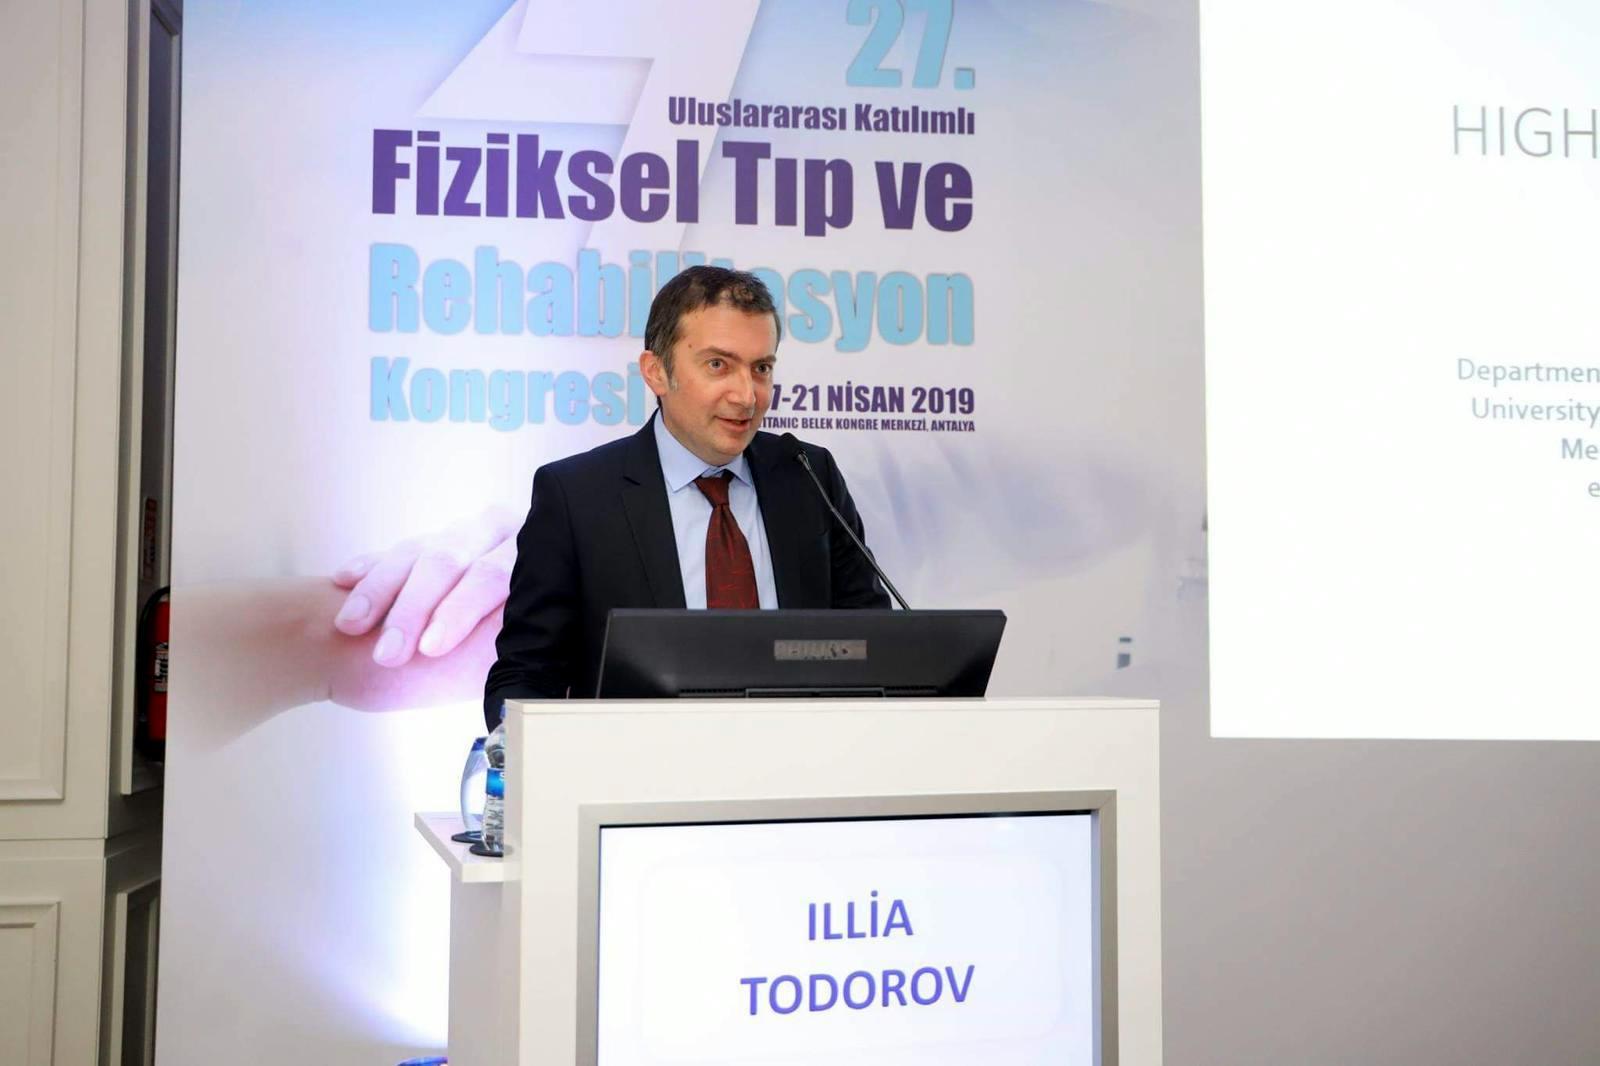 Speech Iliya Todorov